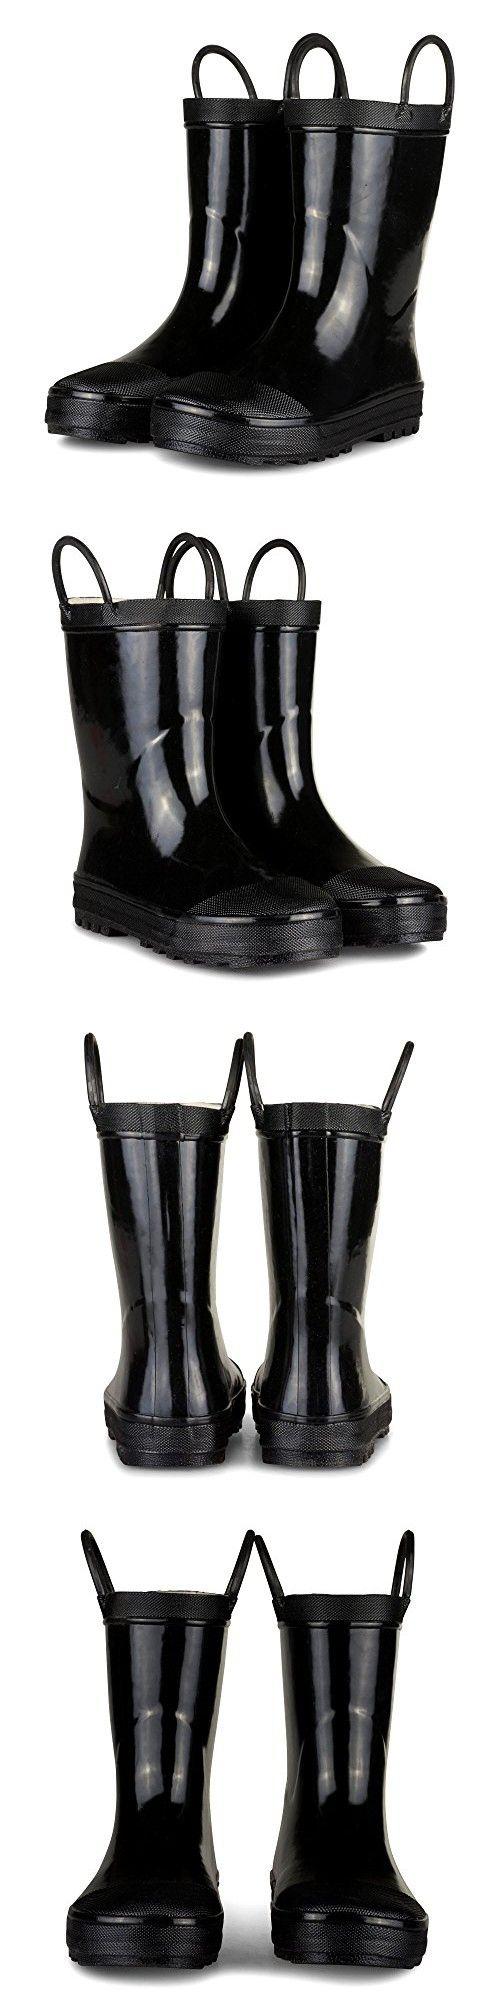 [SBR001P-BLACK-T5] Boys Rain Boots - Black Toddler Boot Easy On Handle Size 5